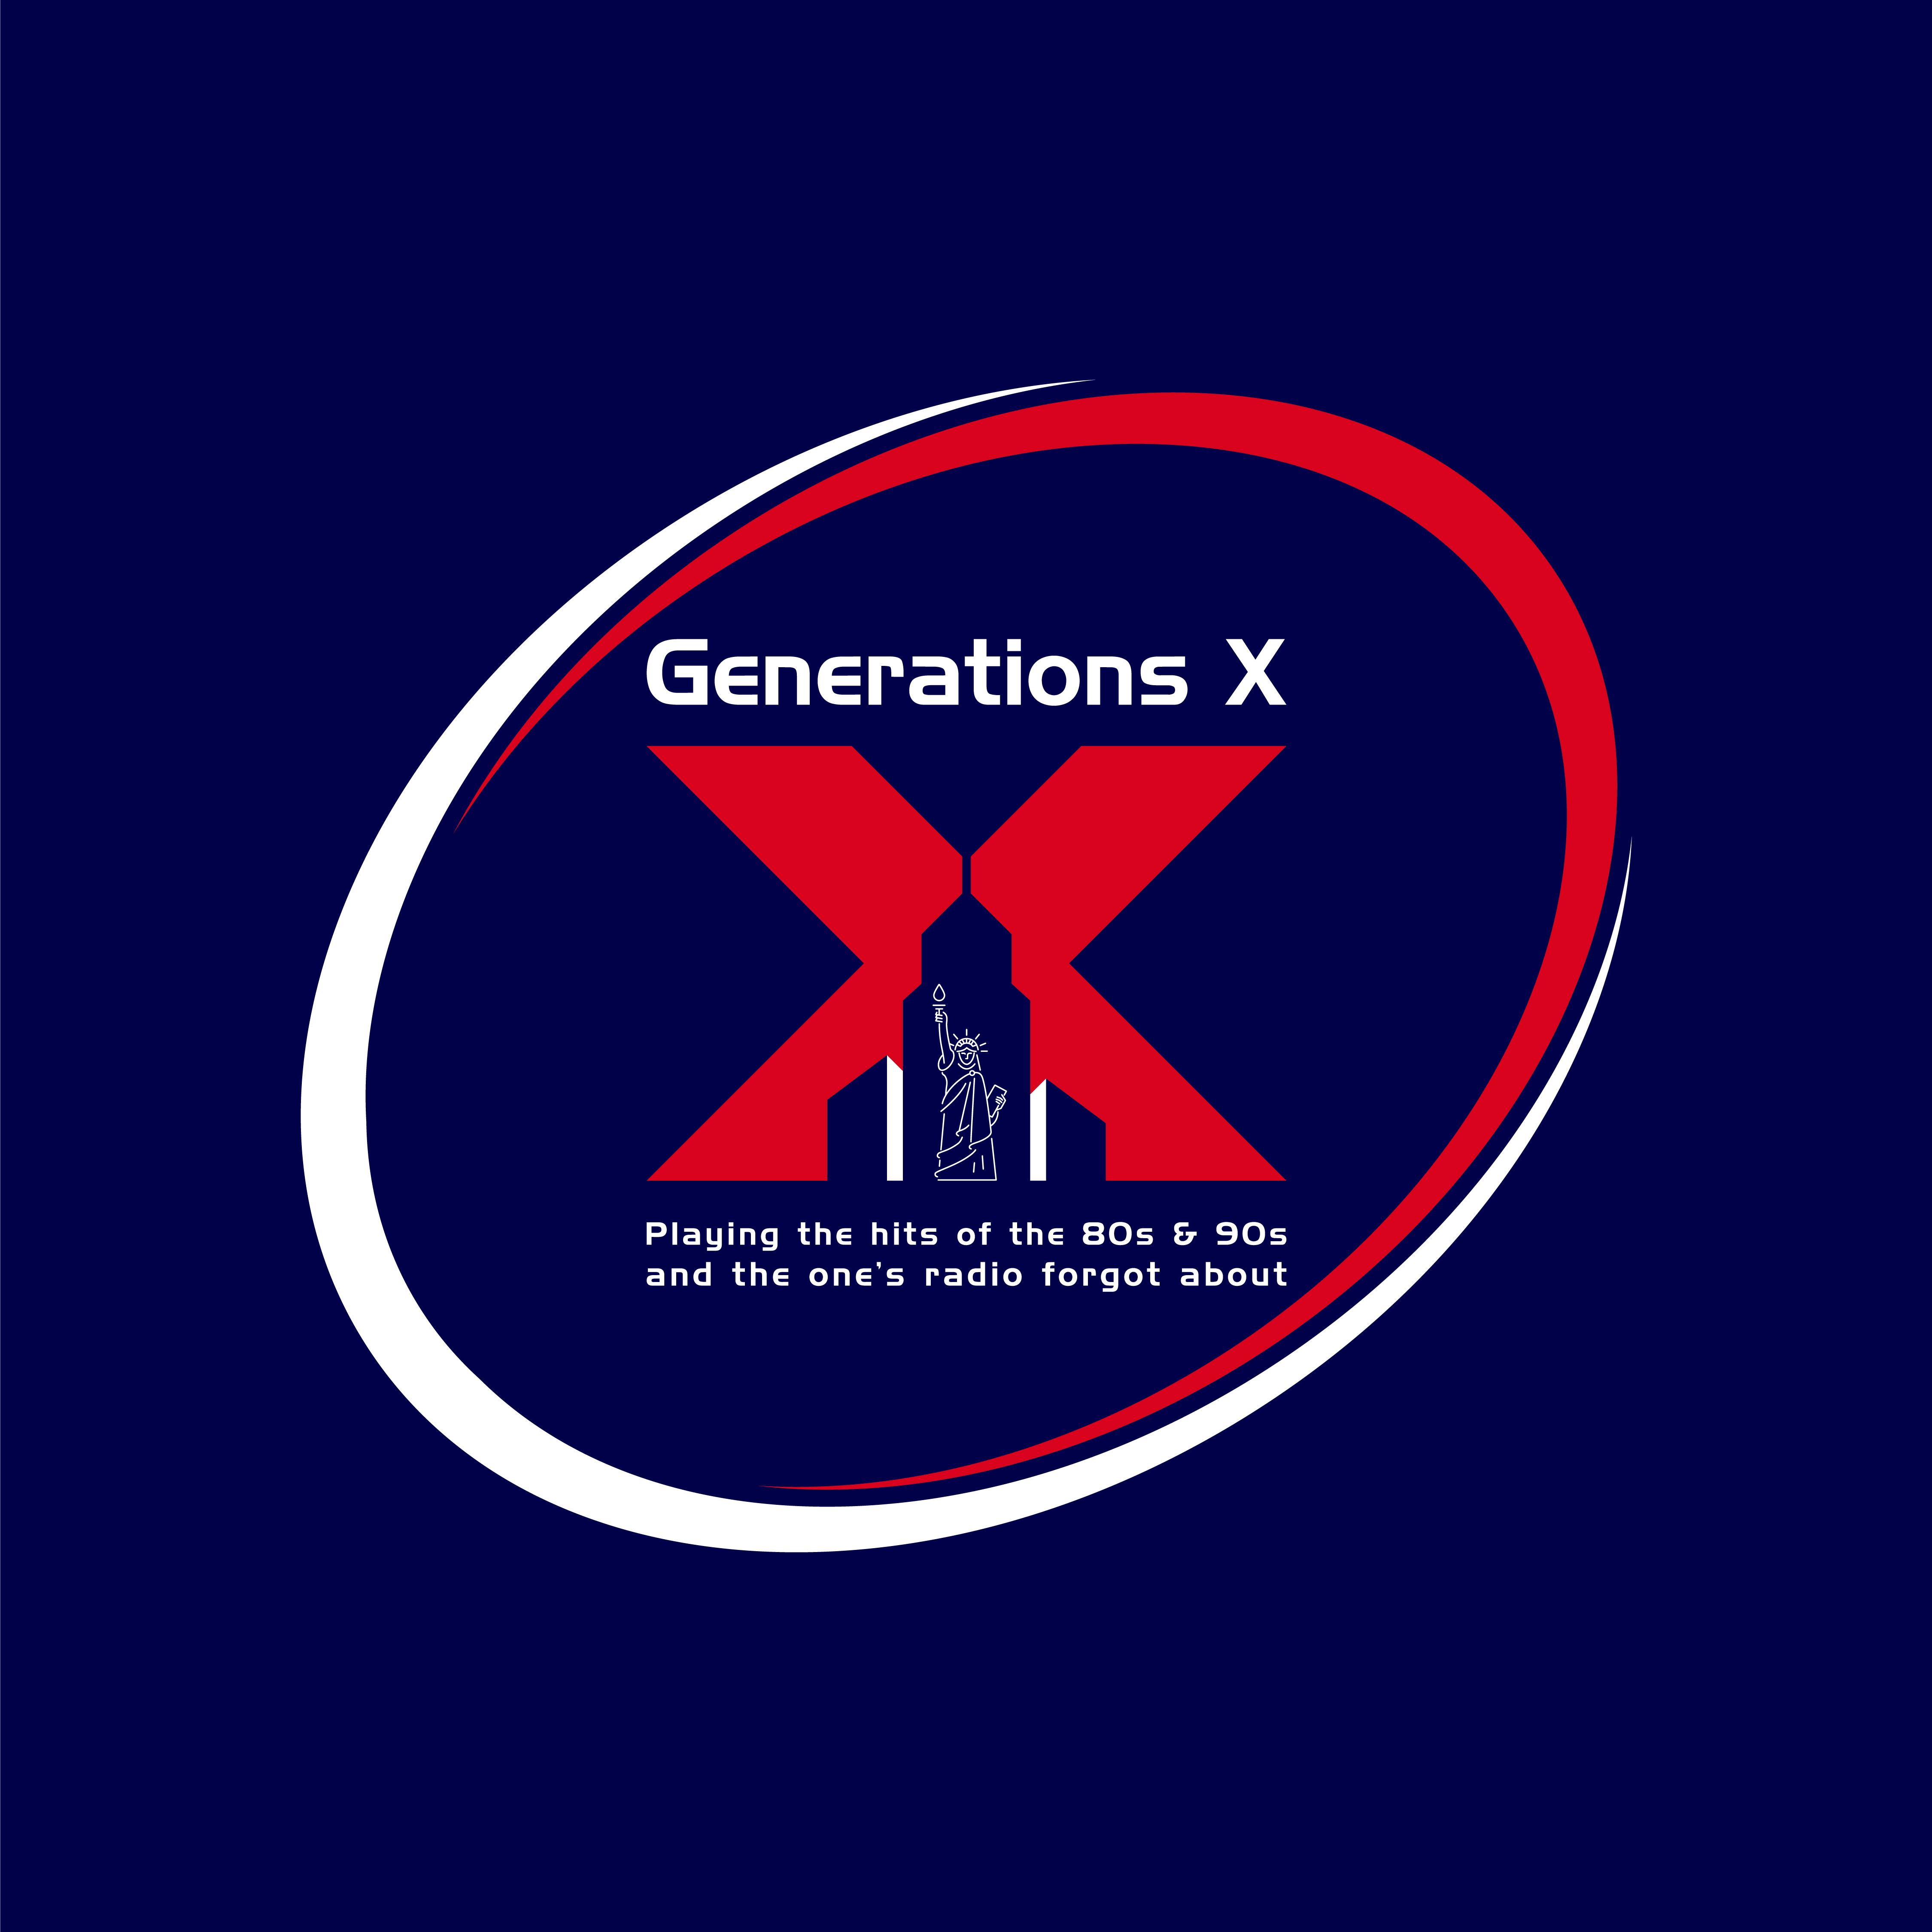 Generations X